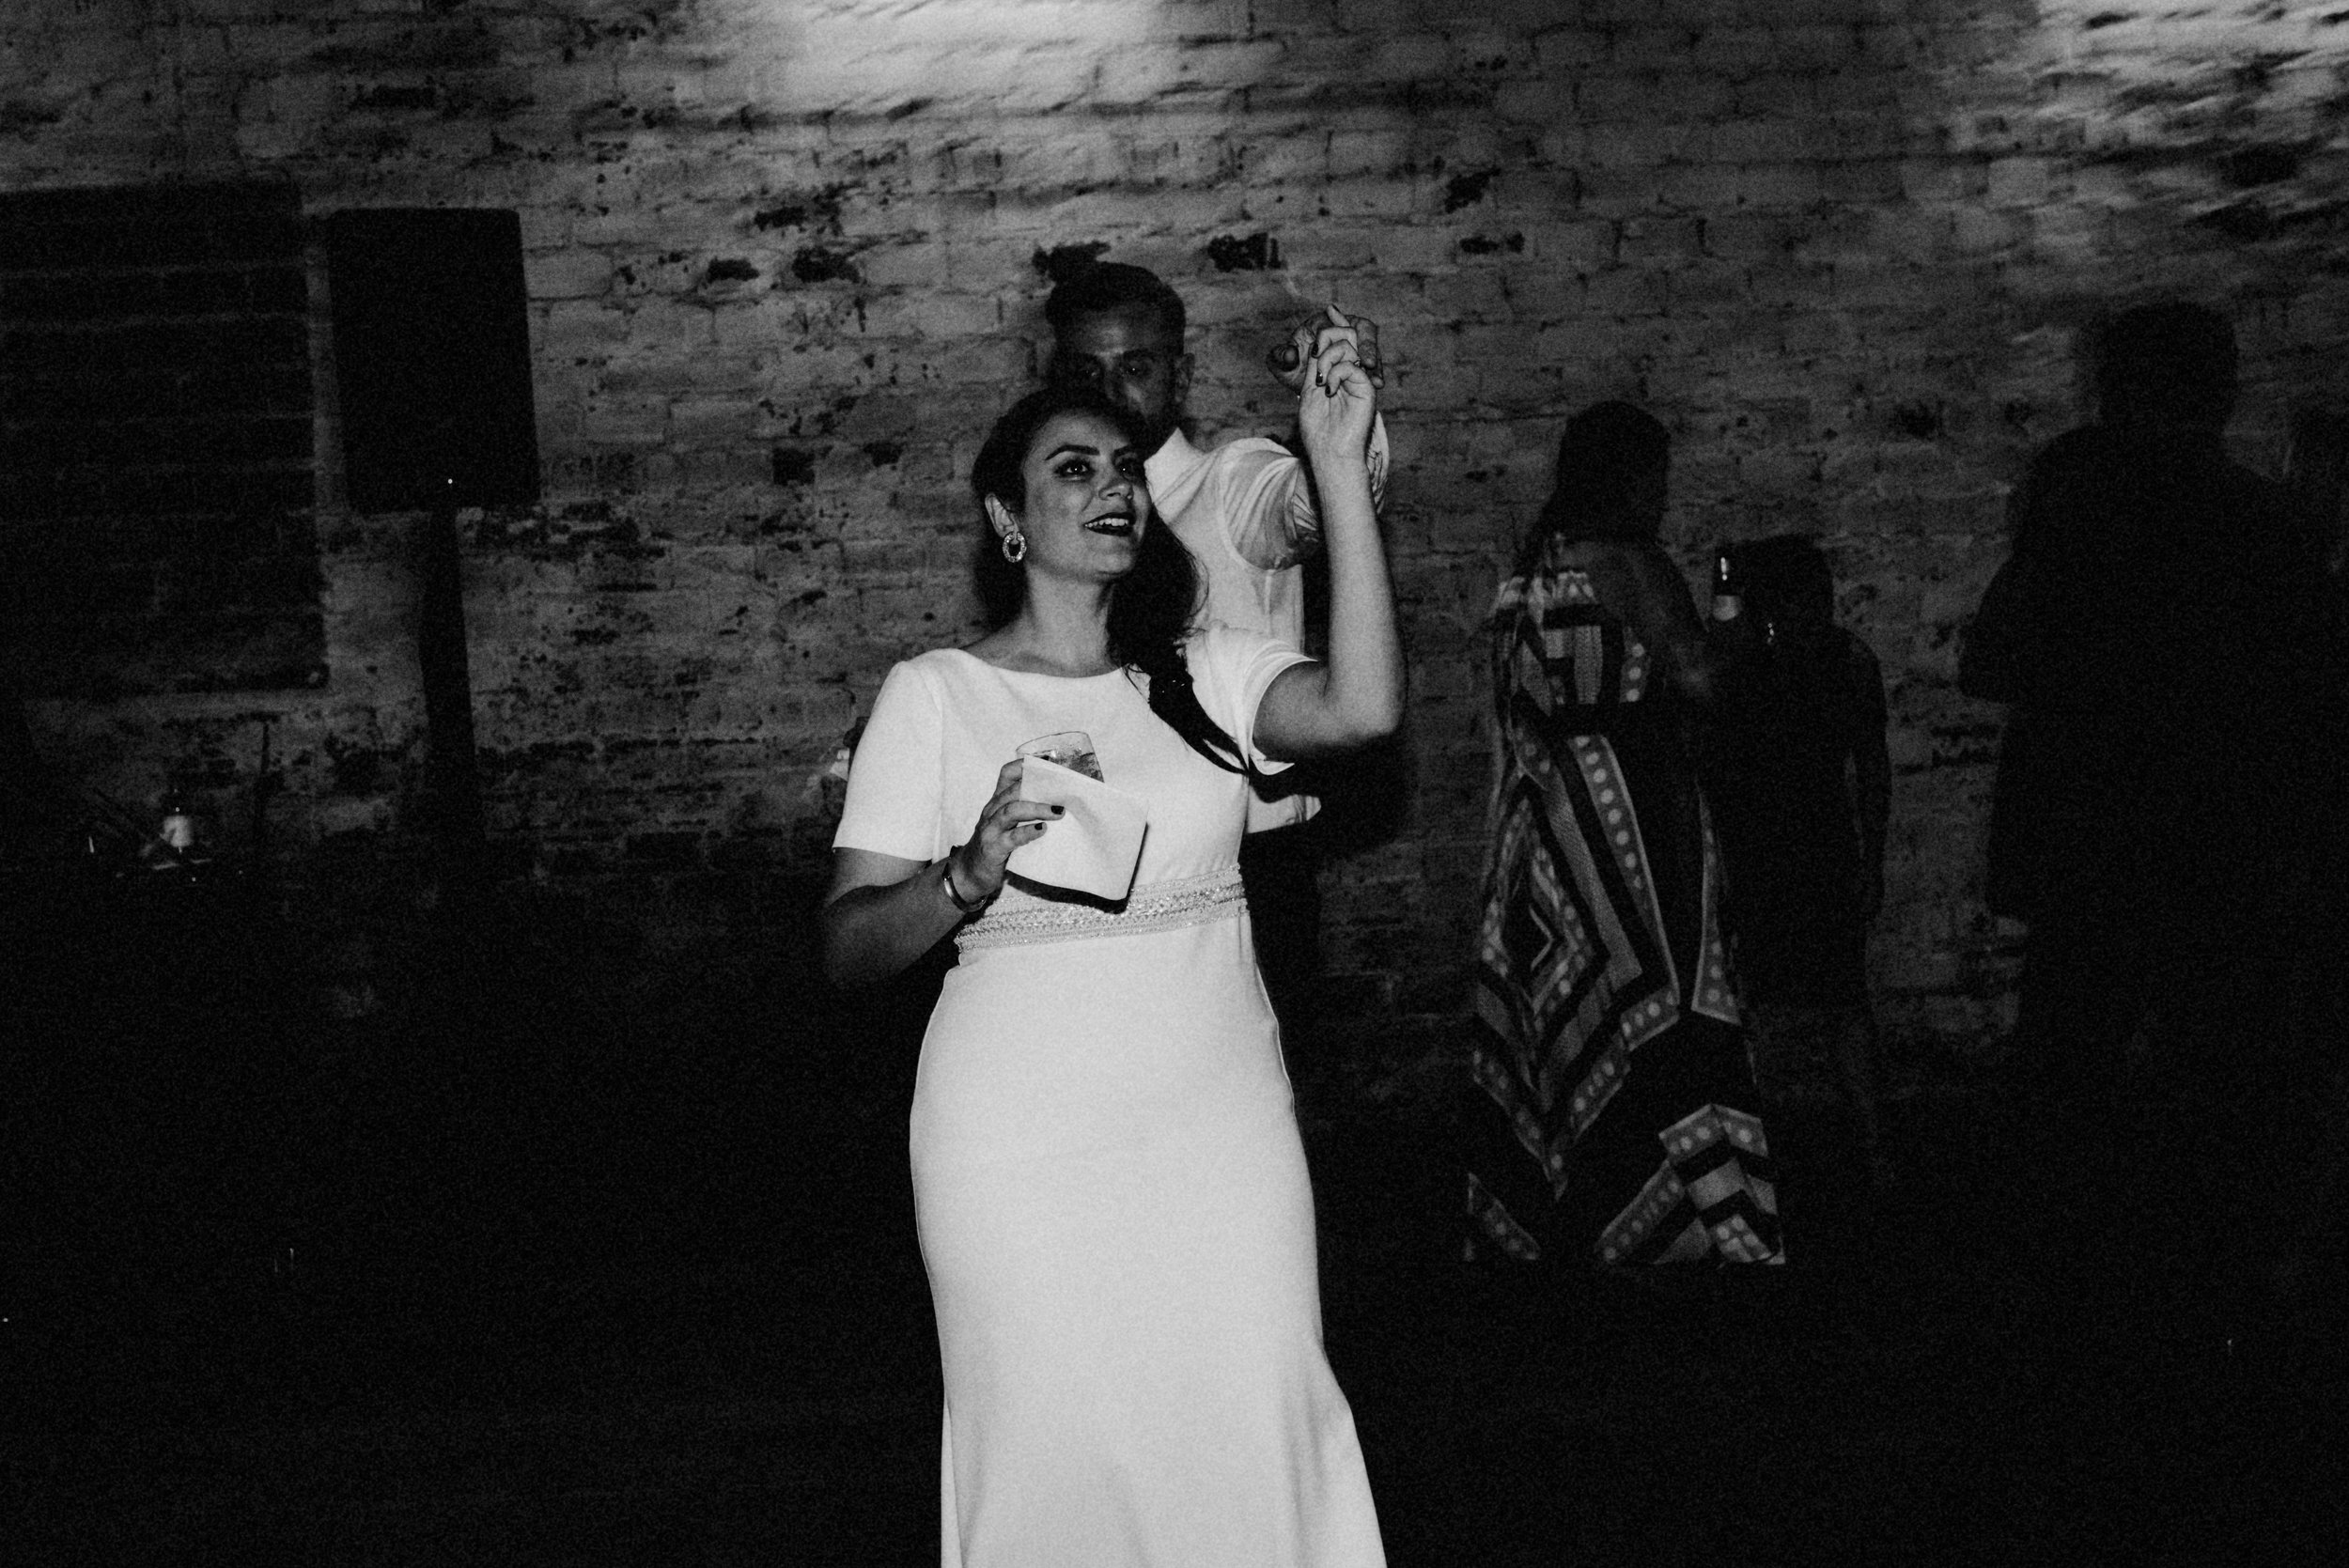 Denee-Leo-Tampa-Florida-Wedding-Rialto-Theatre-510.jpg